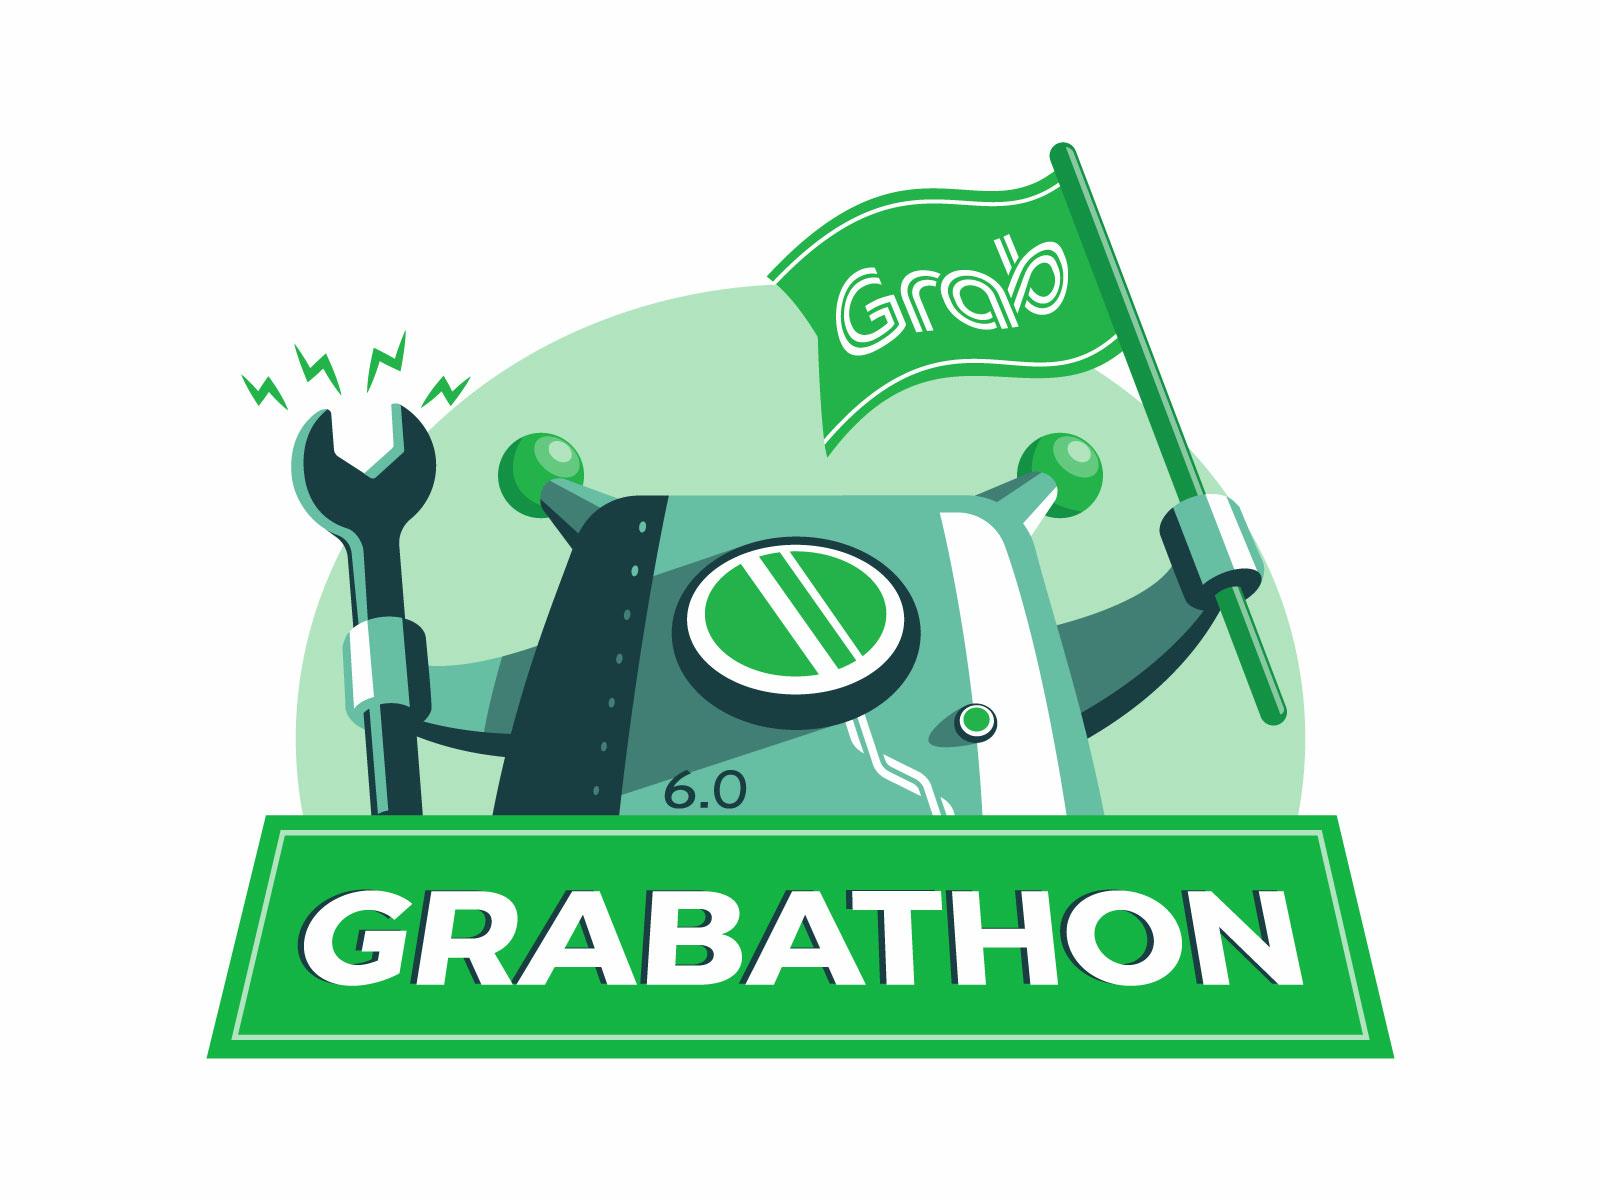 Grabathon6